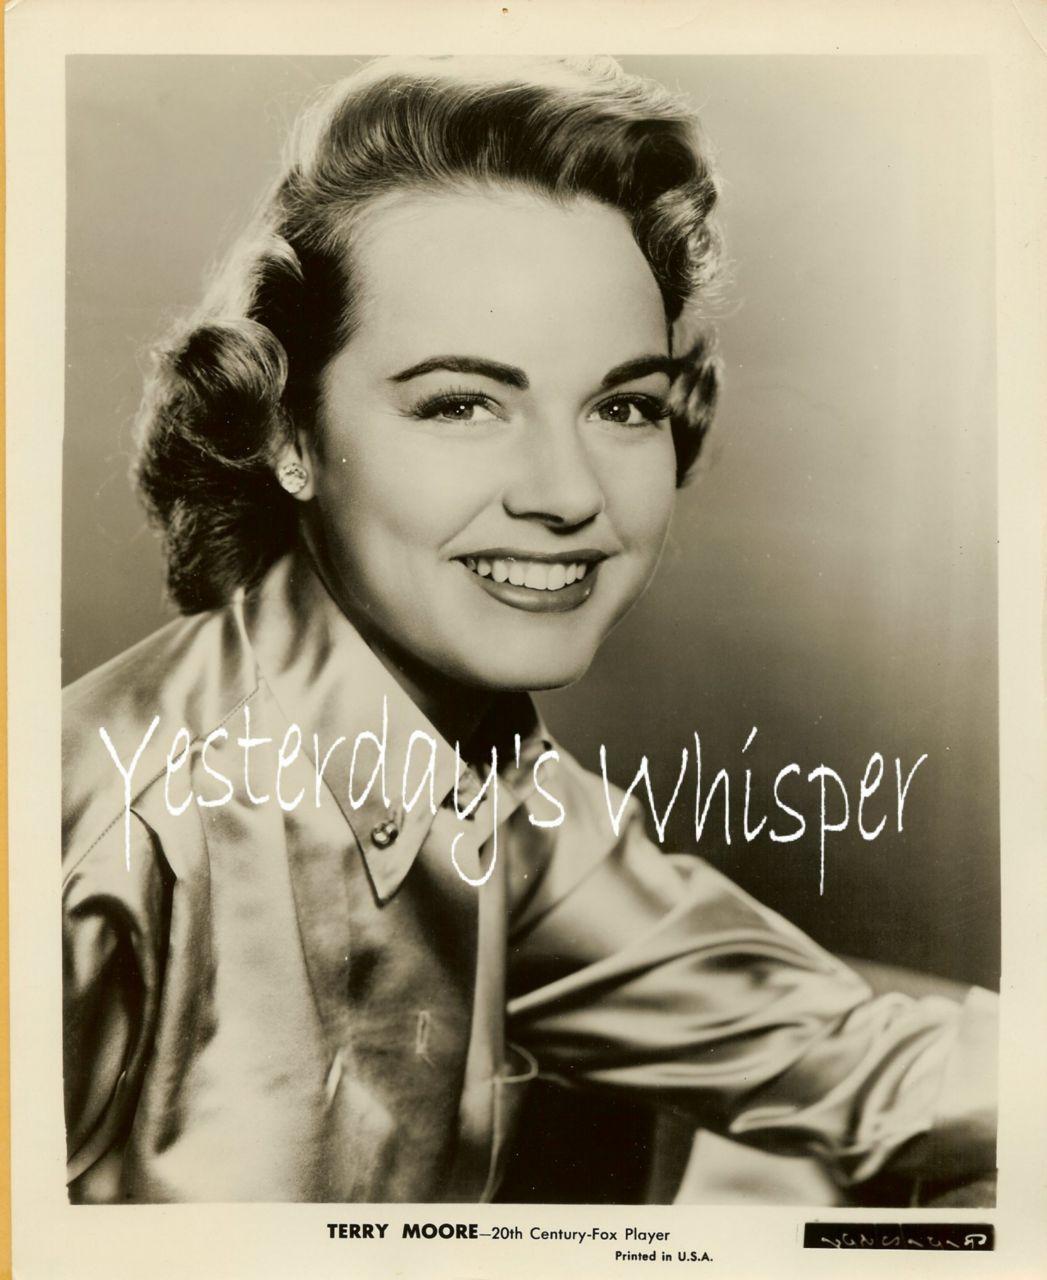 1950s 20th Century Fox Player Promo Photo Terry Moore K276